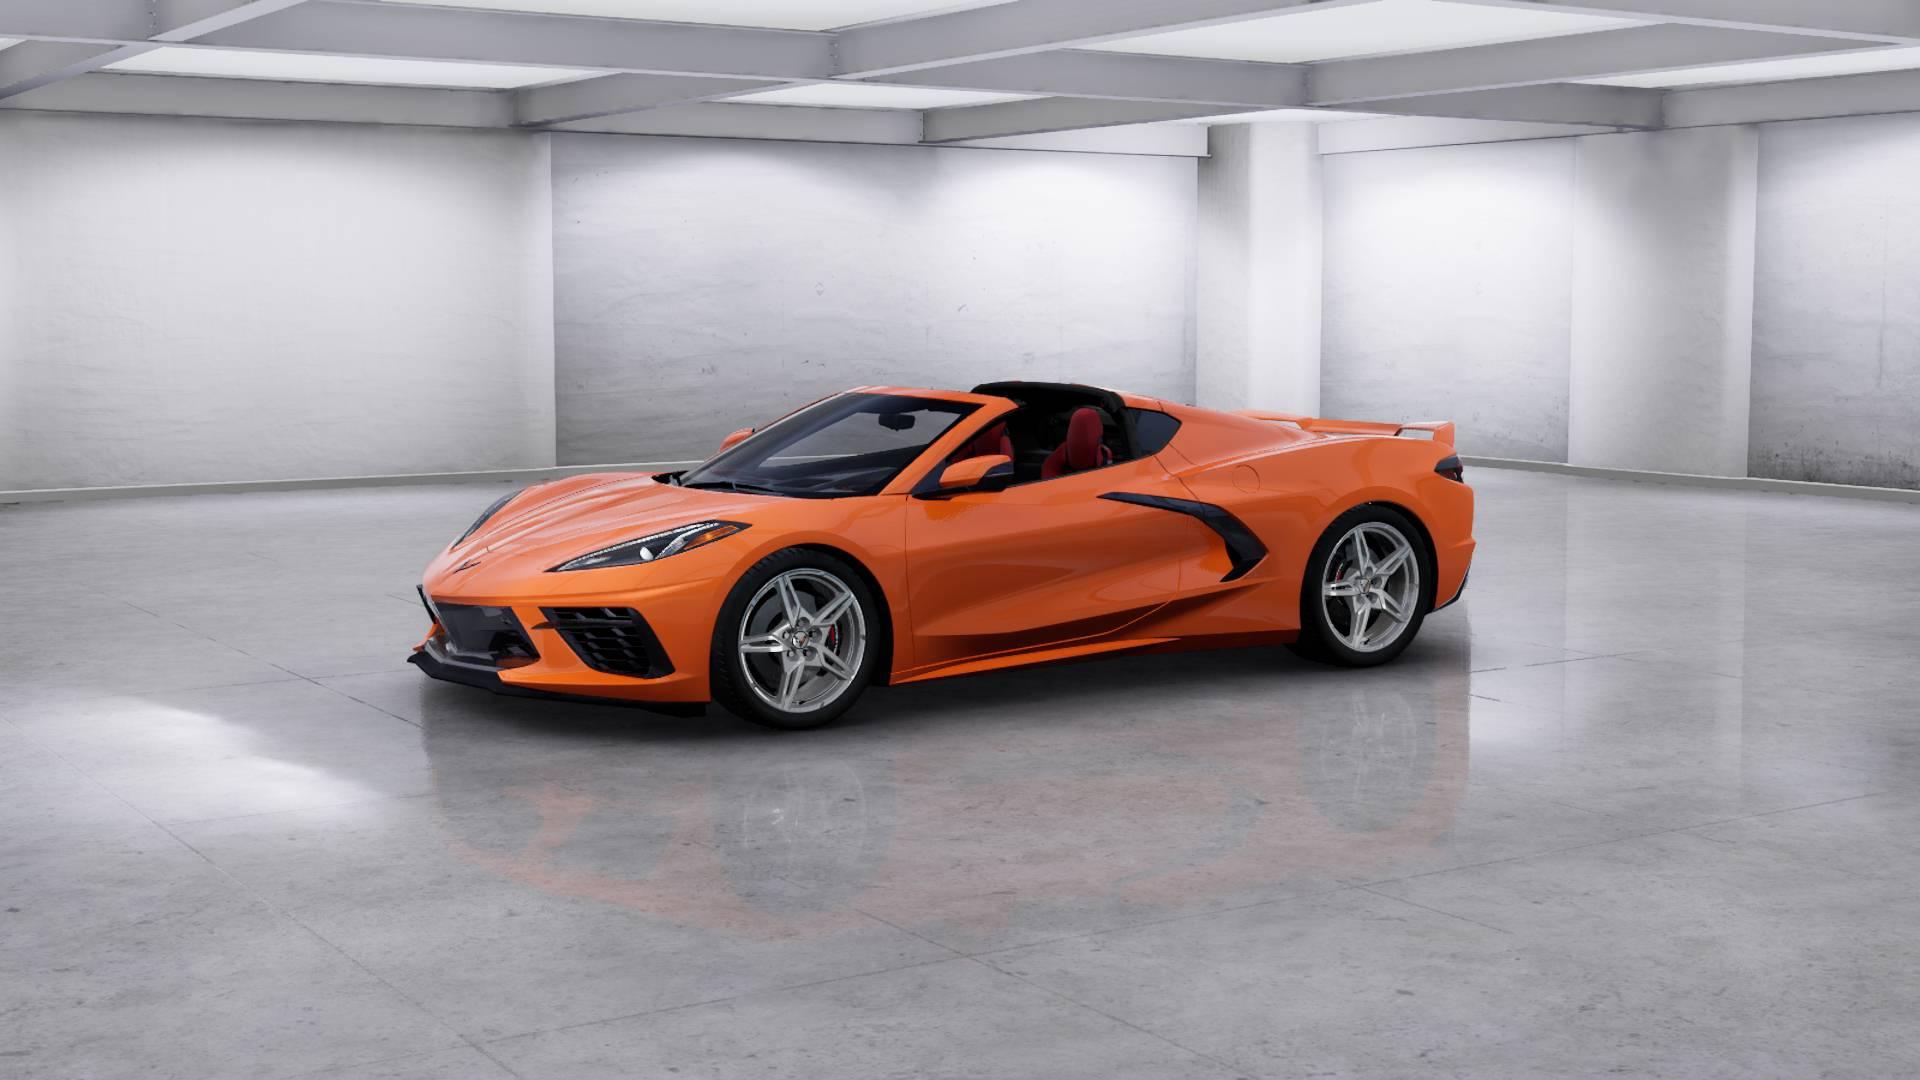 2020 Corvette Stingray Colors And Options Automobile Magazine